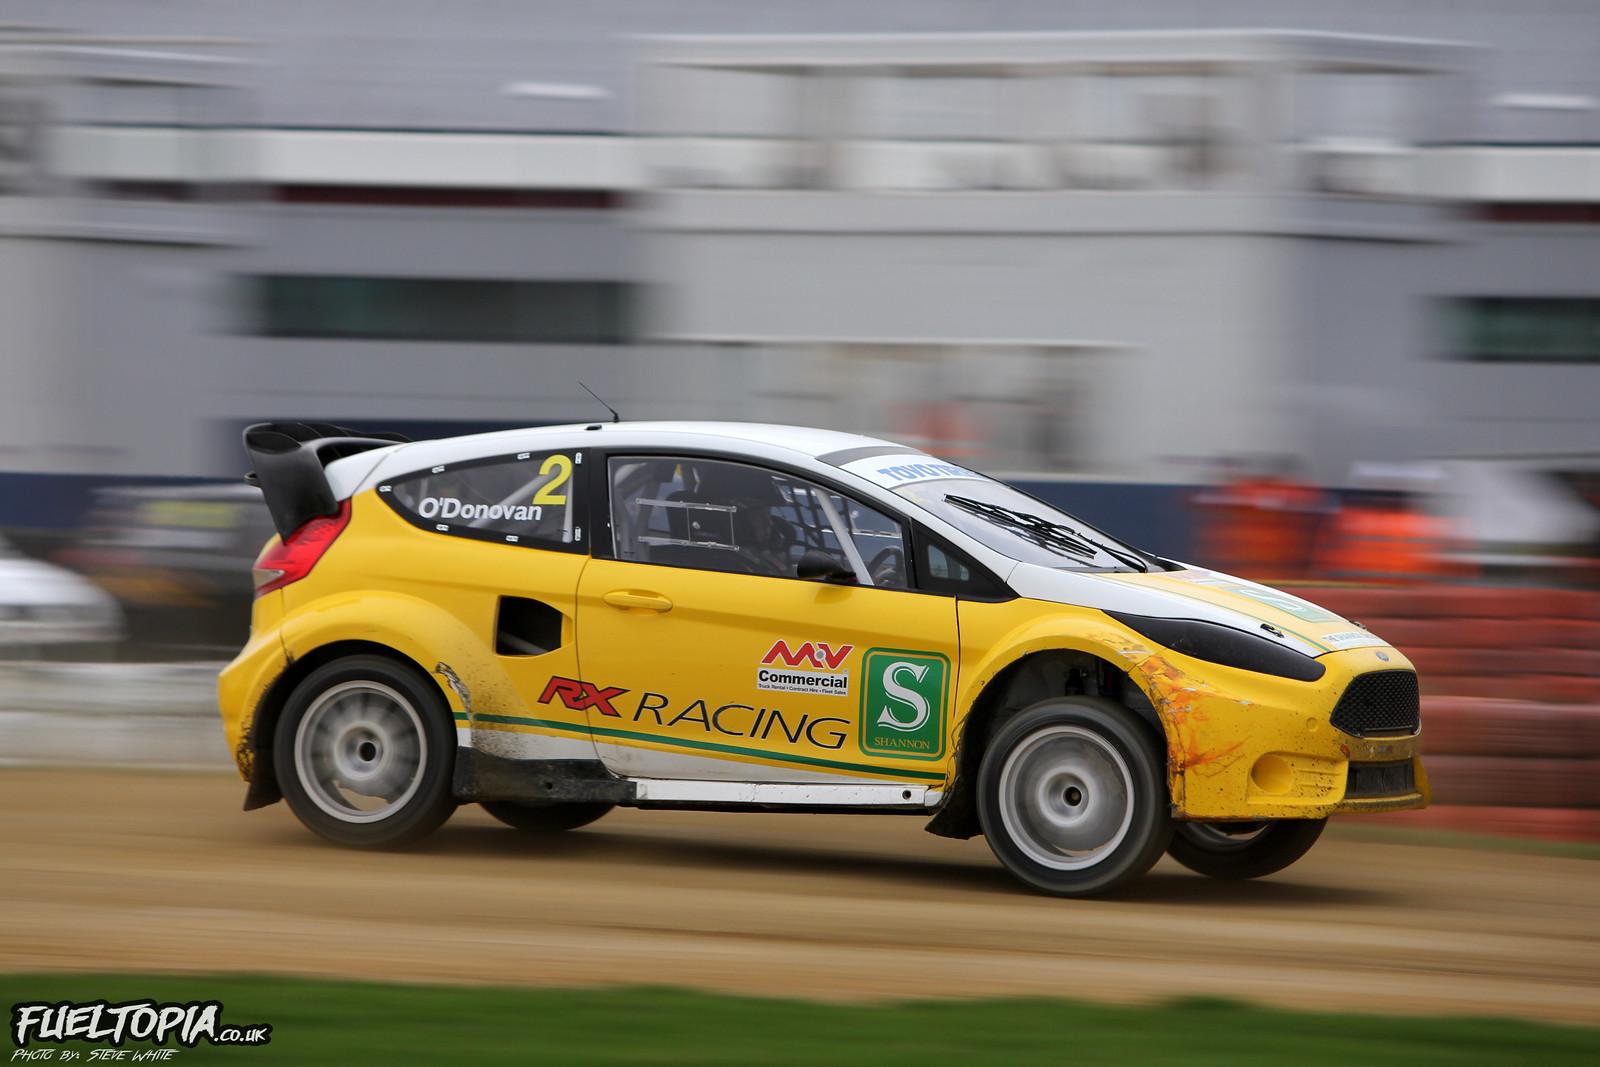 Ollie O'Donovan Ford Fiesta Silverstone BRX British Rallycross Championship 2018 Steve White Fueltopia